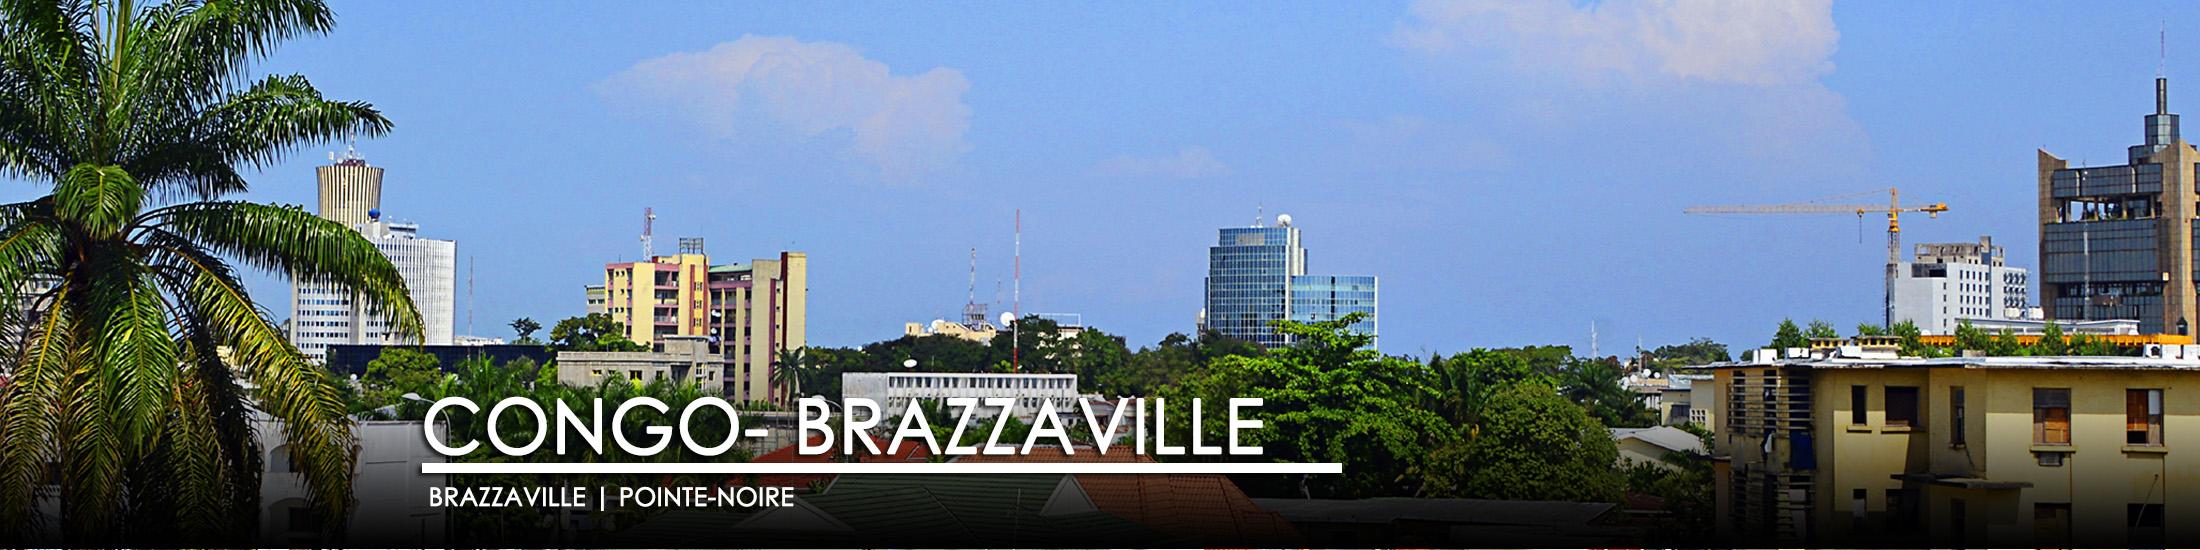 Image result for 3. Brazzaville, Congo